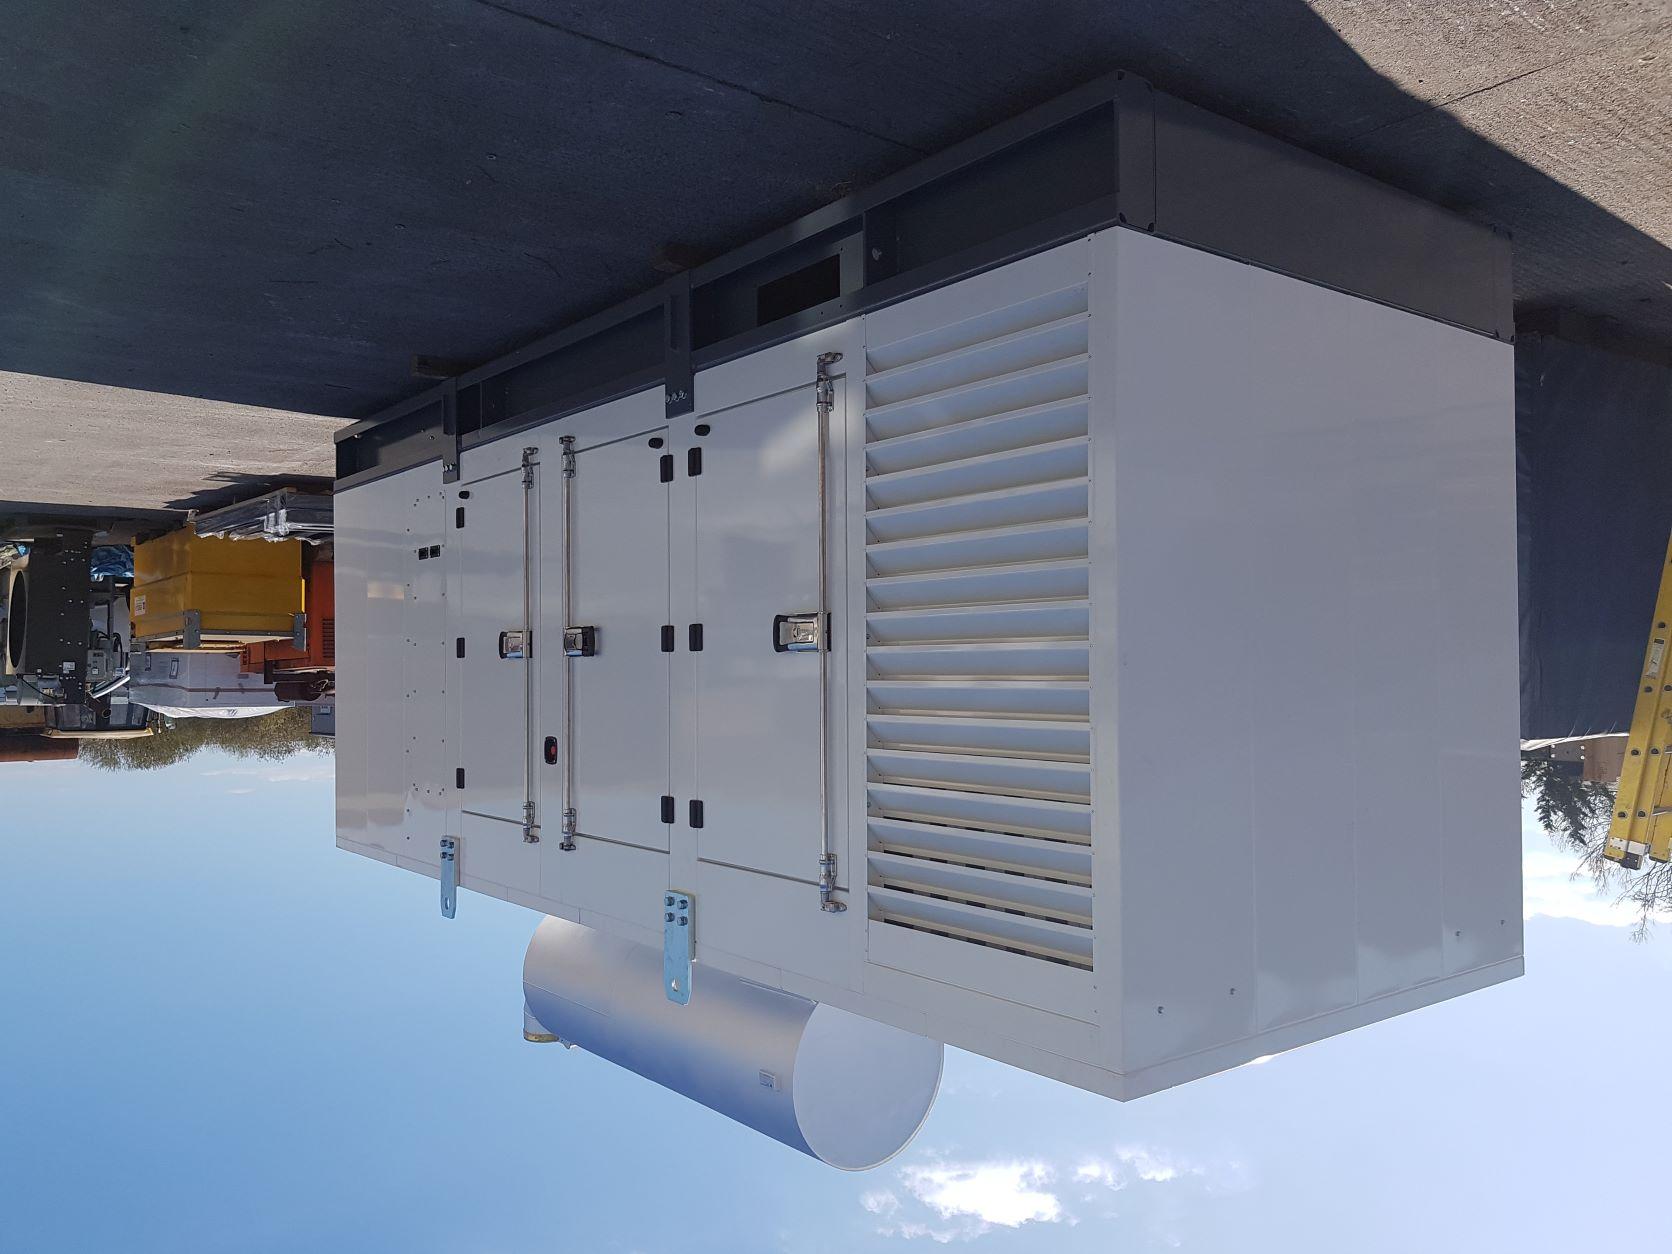 North England NHS Hospital Canopy Generator